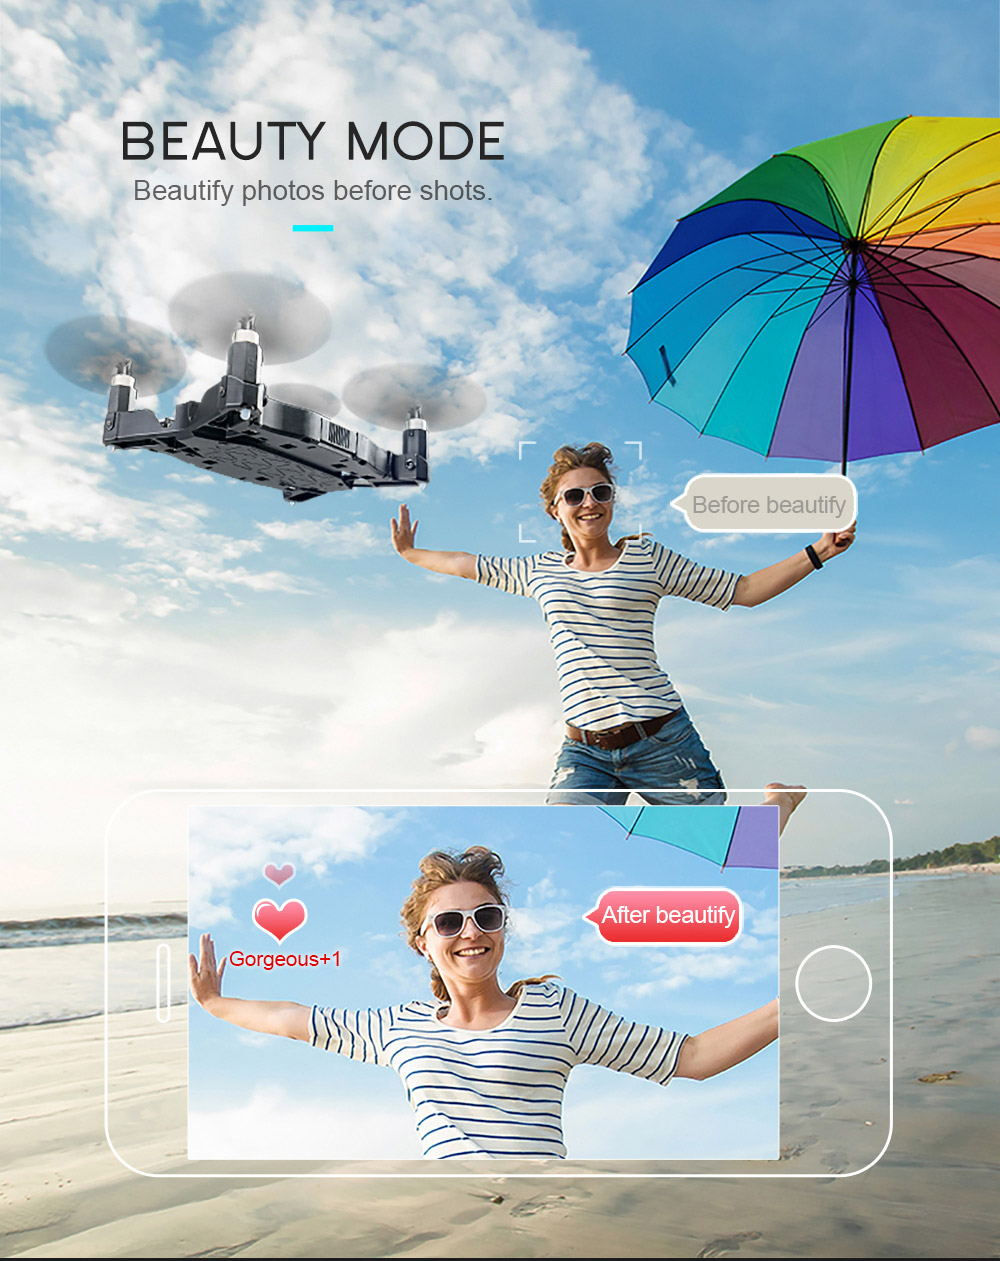 jjrc h49 sol wifi mini foldable rc pocket selfie drone for sale